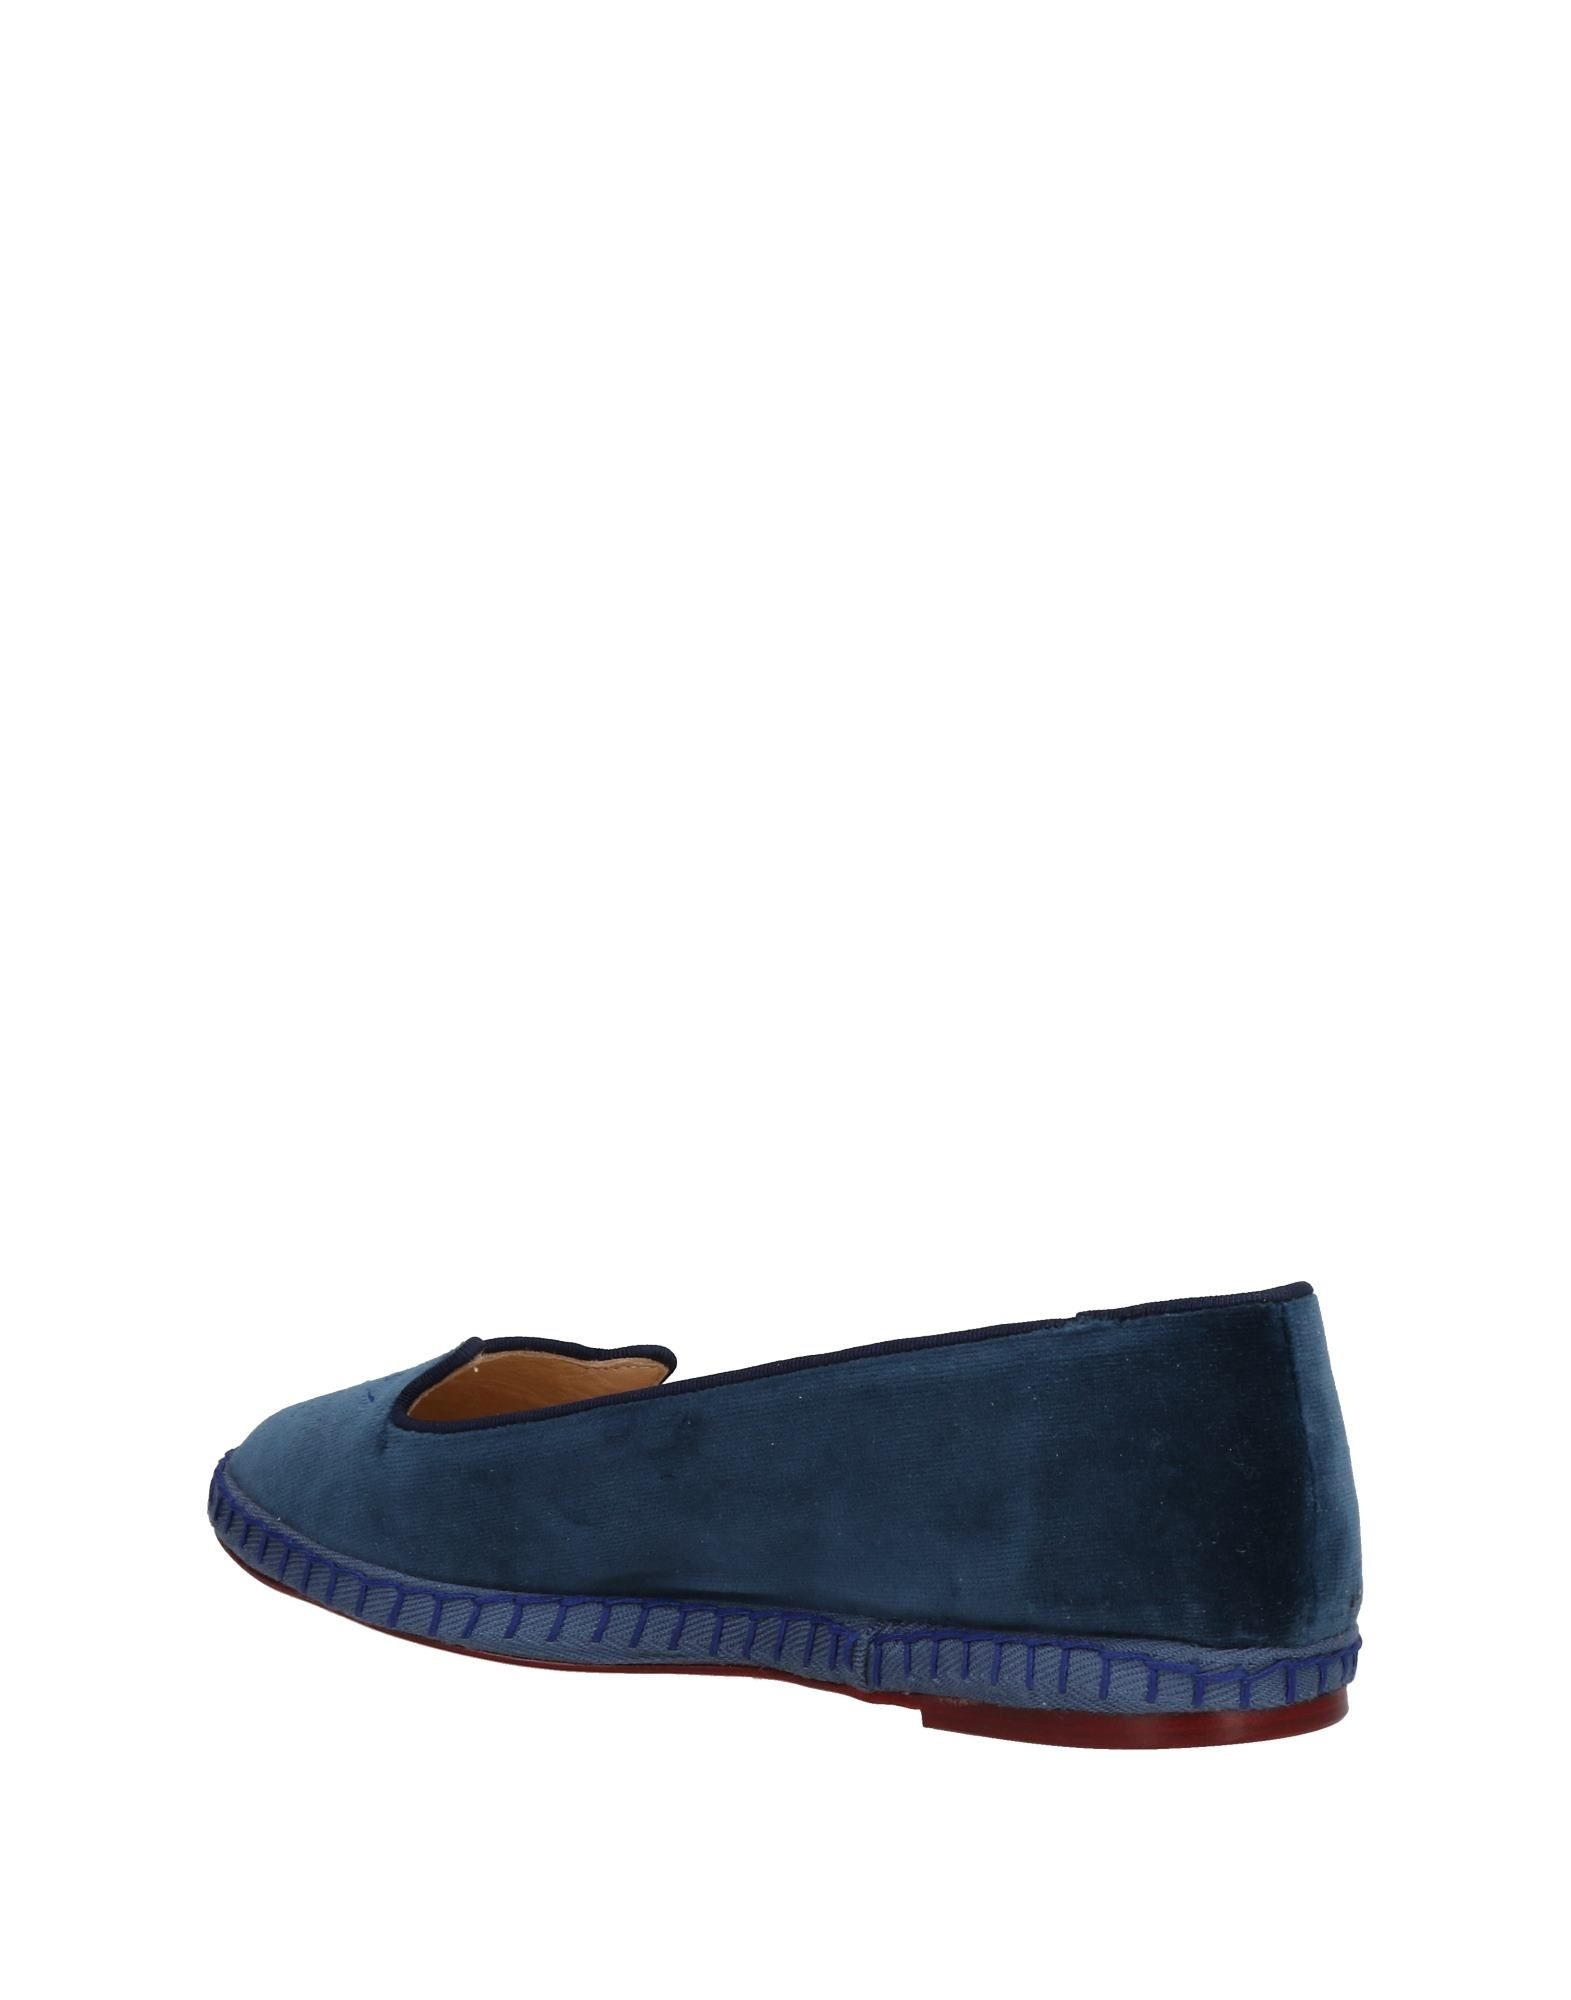 Charlotte Olympia Mokassins Damen  11487120HOGut aussehende strapazierfähige Schuhe